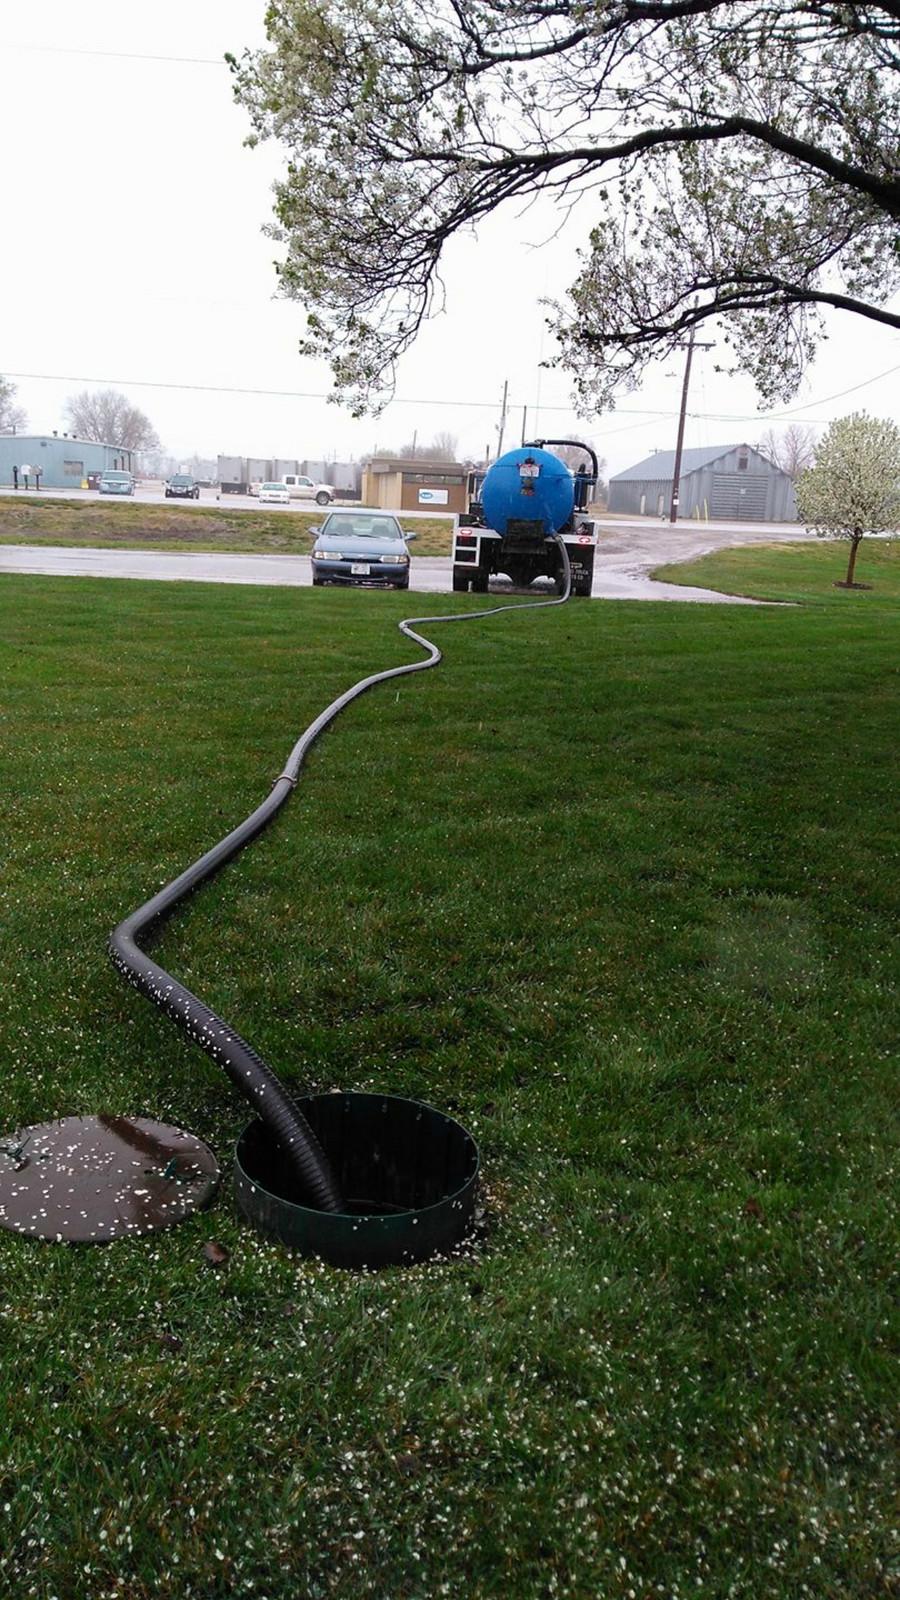 salinasepticservice | Septic Tank Pumping Services